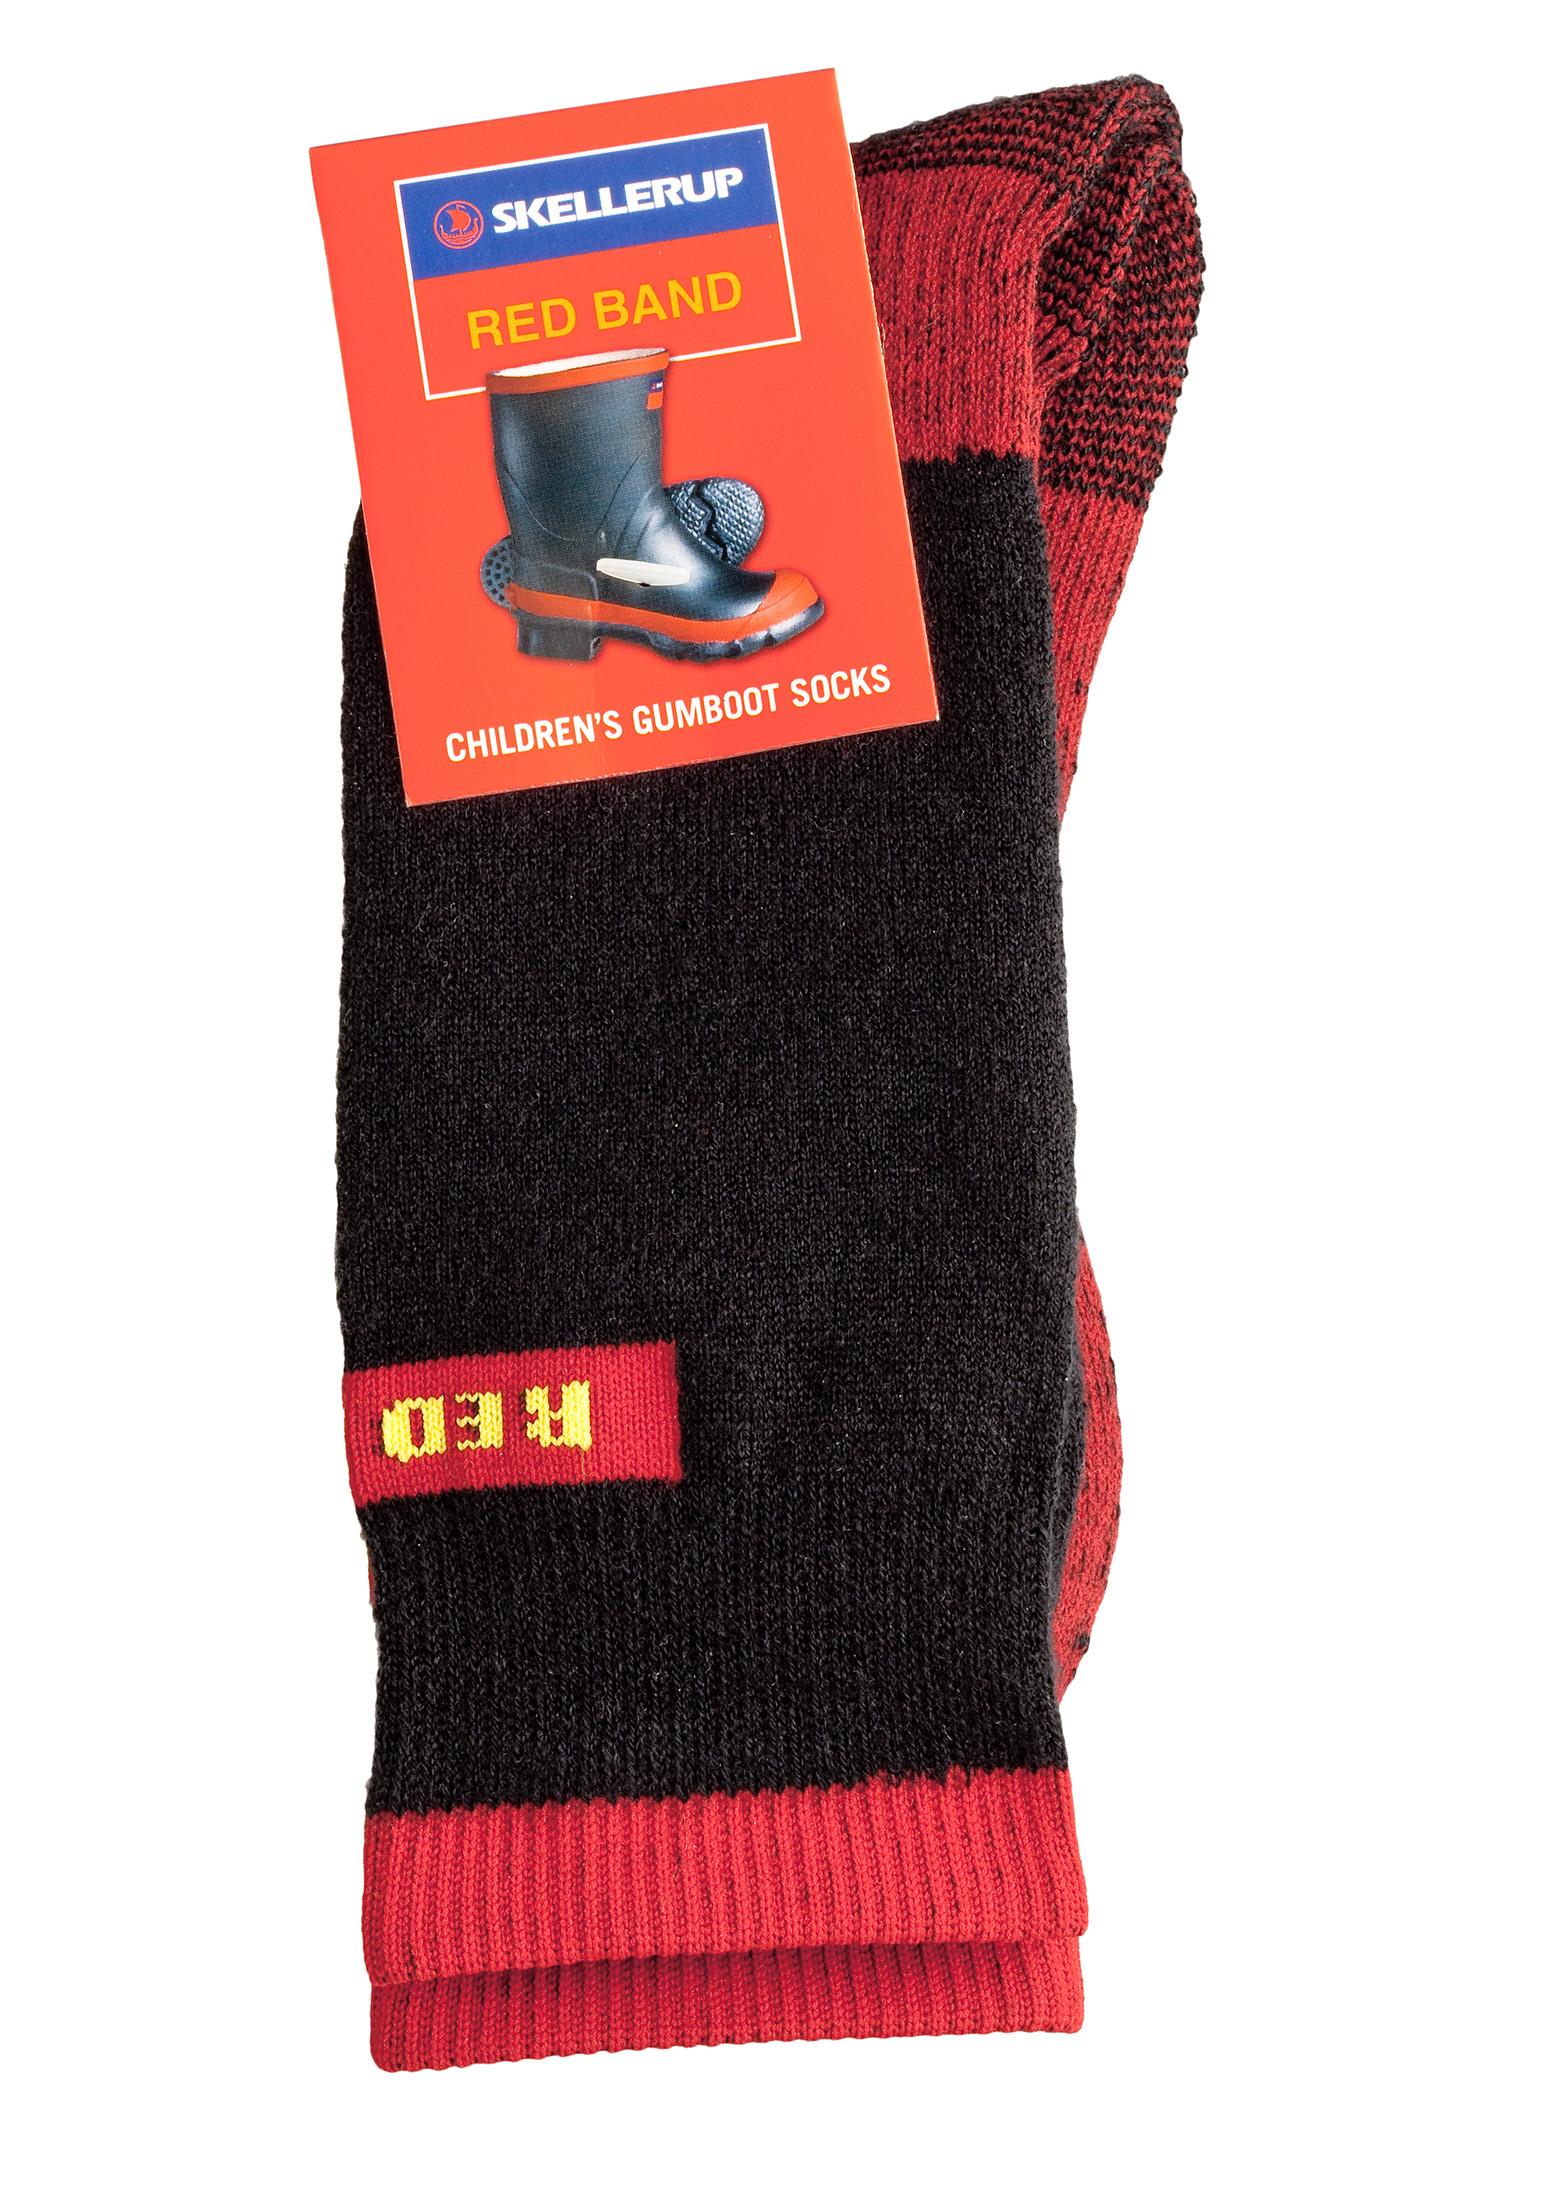 Image of Skellerup Red Band Childrens Gumboot Sock